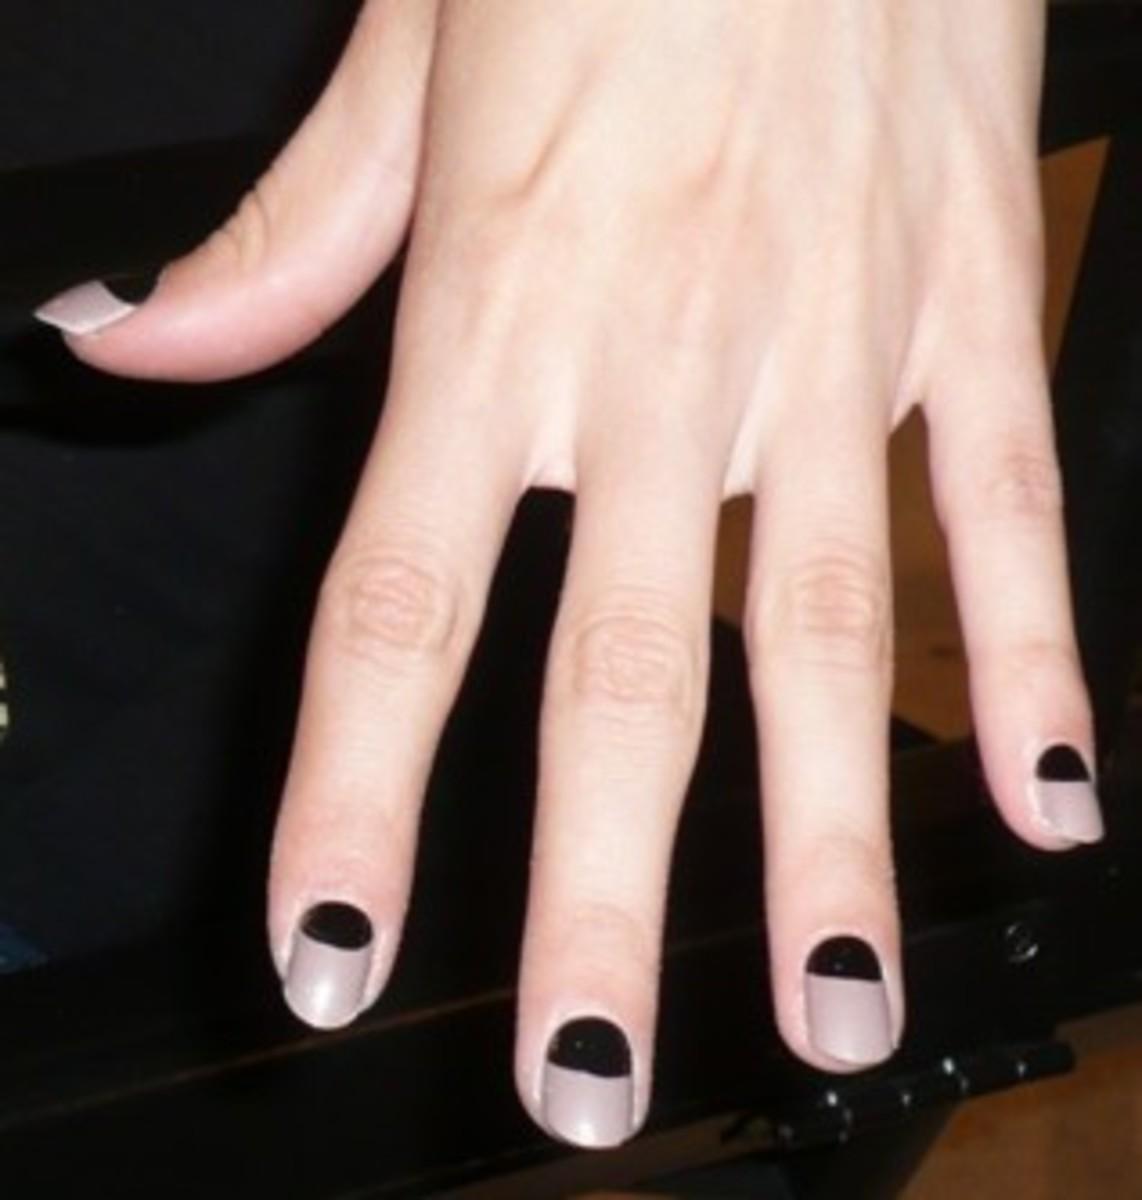 Half-Moon-Manicure-at-Vena-Cava-Spring-2011